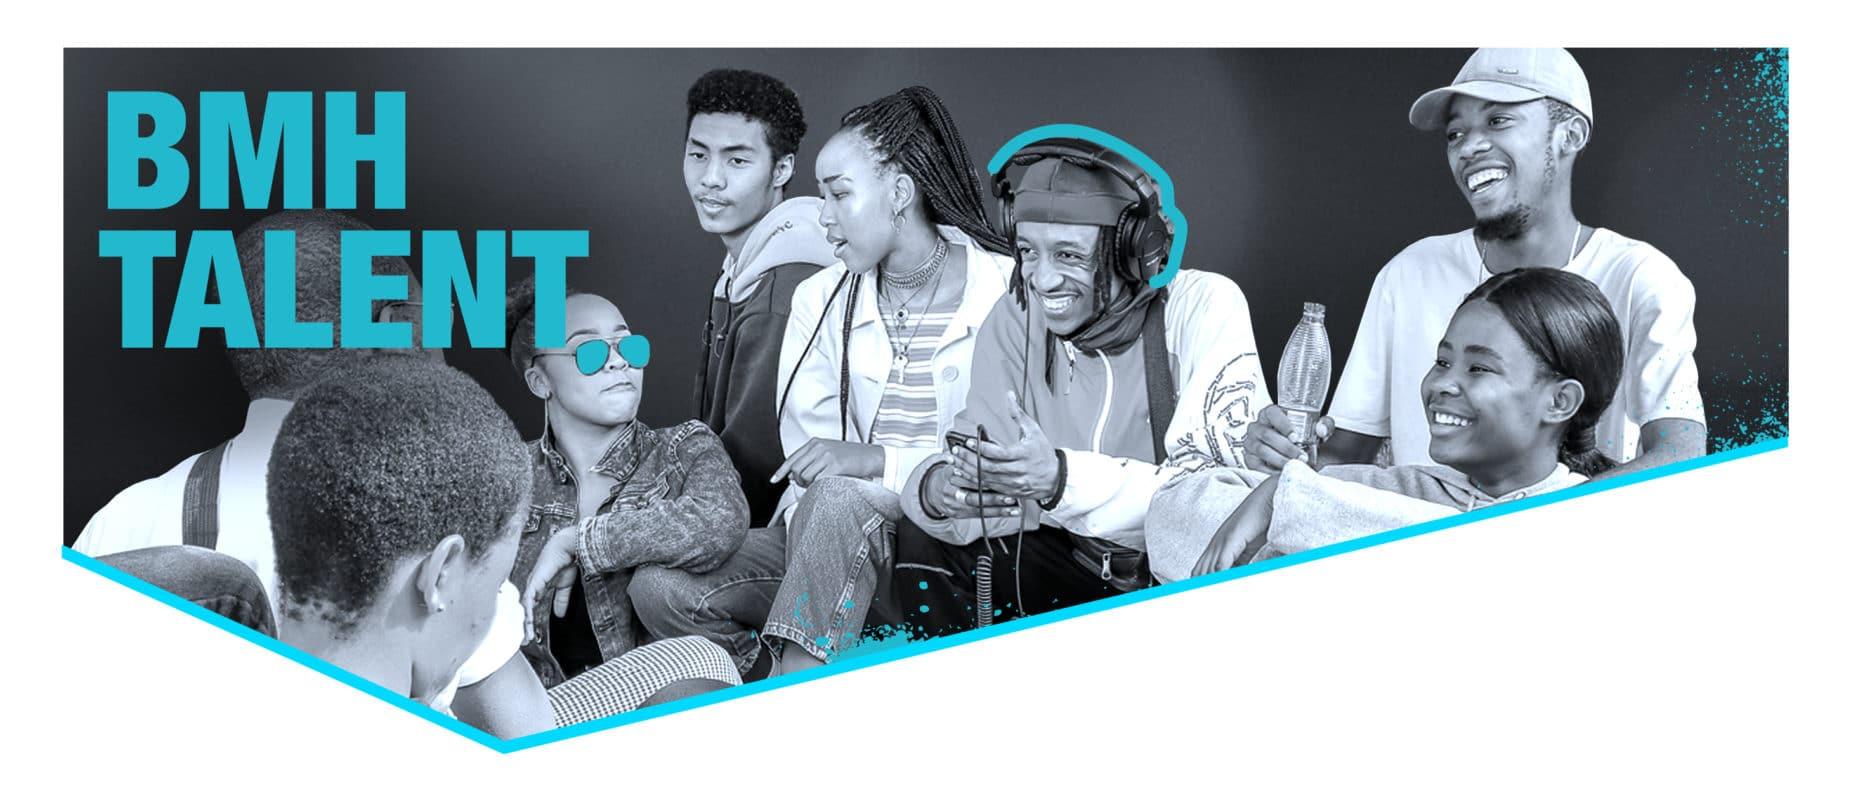 17833-BMH-2020-Website-Banner-BMH-Talent-V02-1851x800